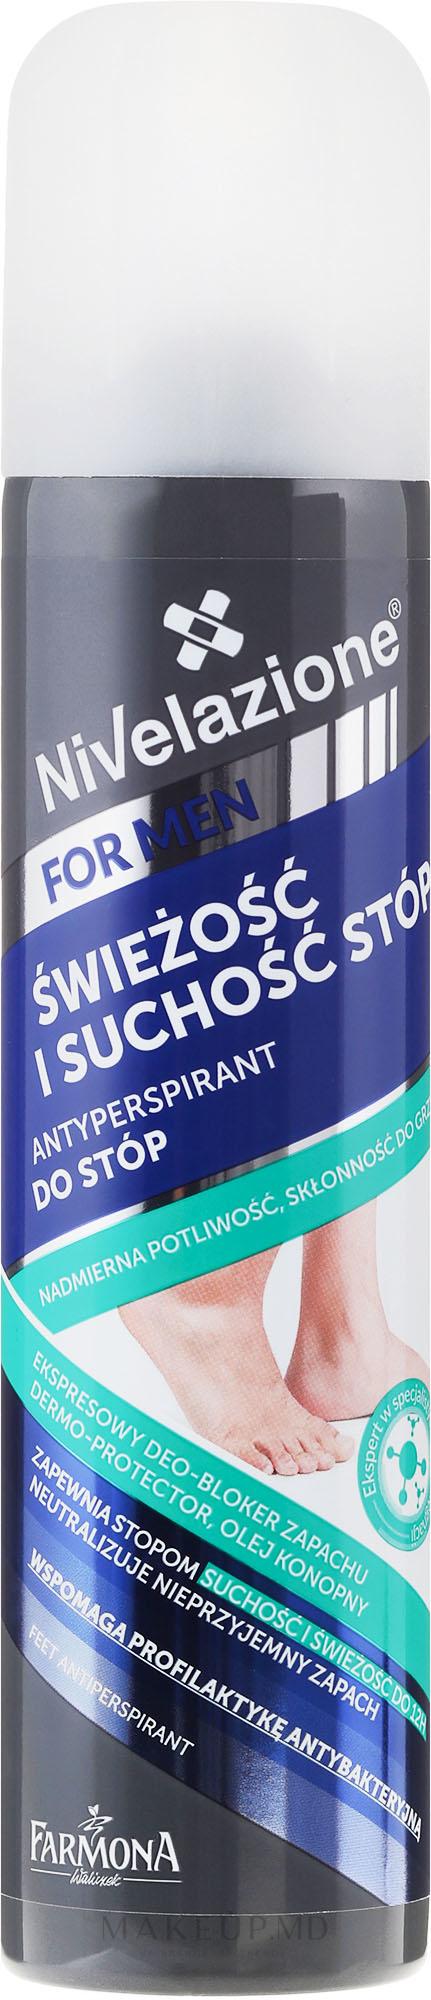 Deodorant pentru picioare - Farmona Nivelazione For Men Feet Antiperspirant — фото 180 ml